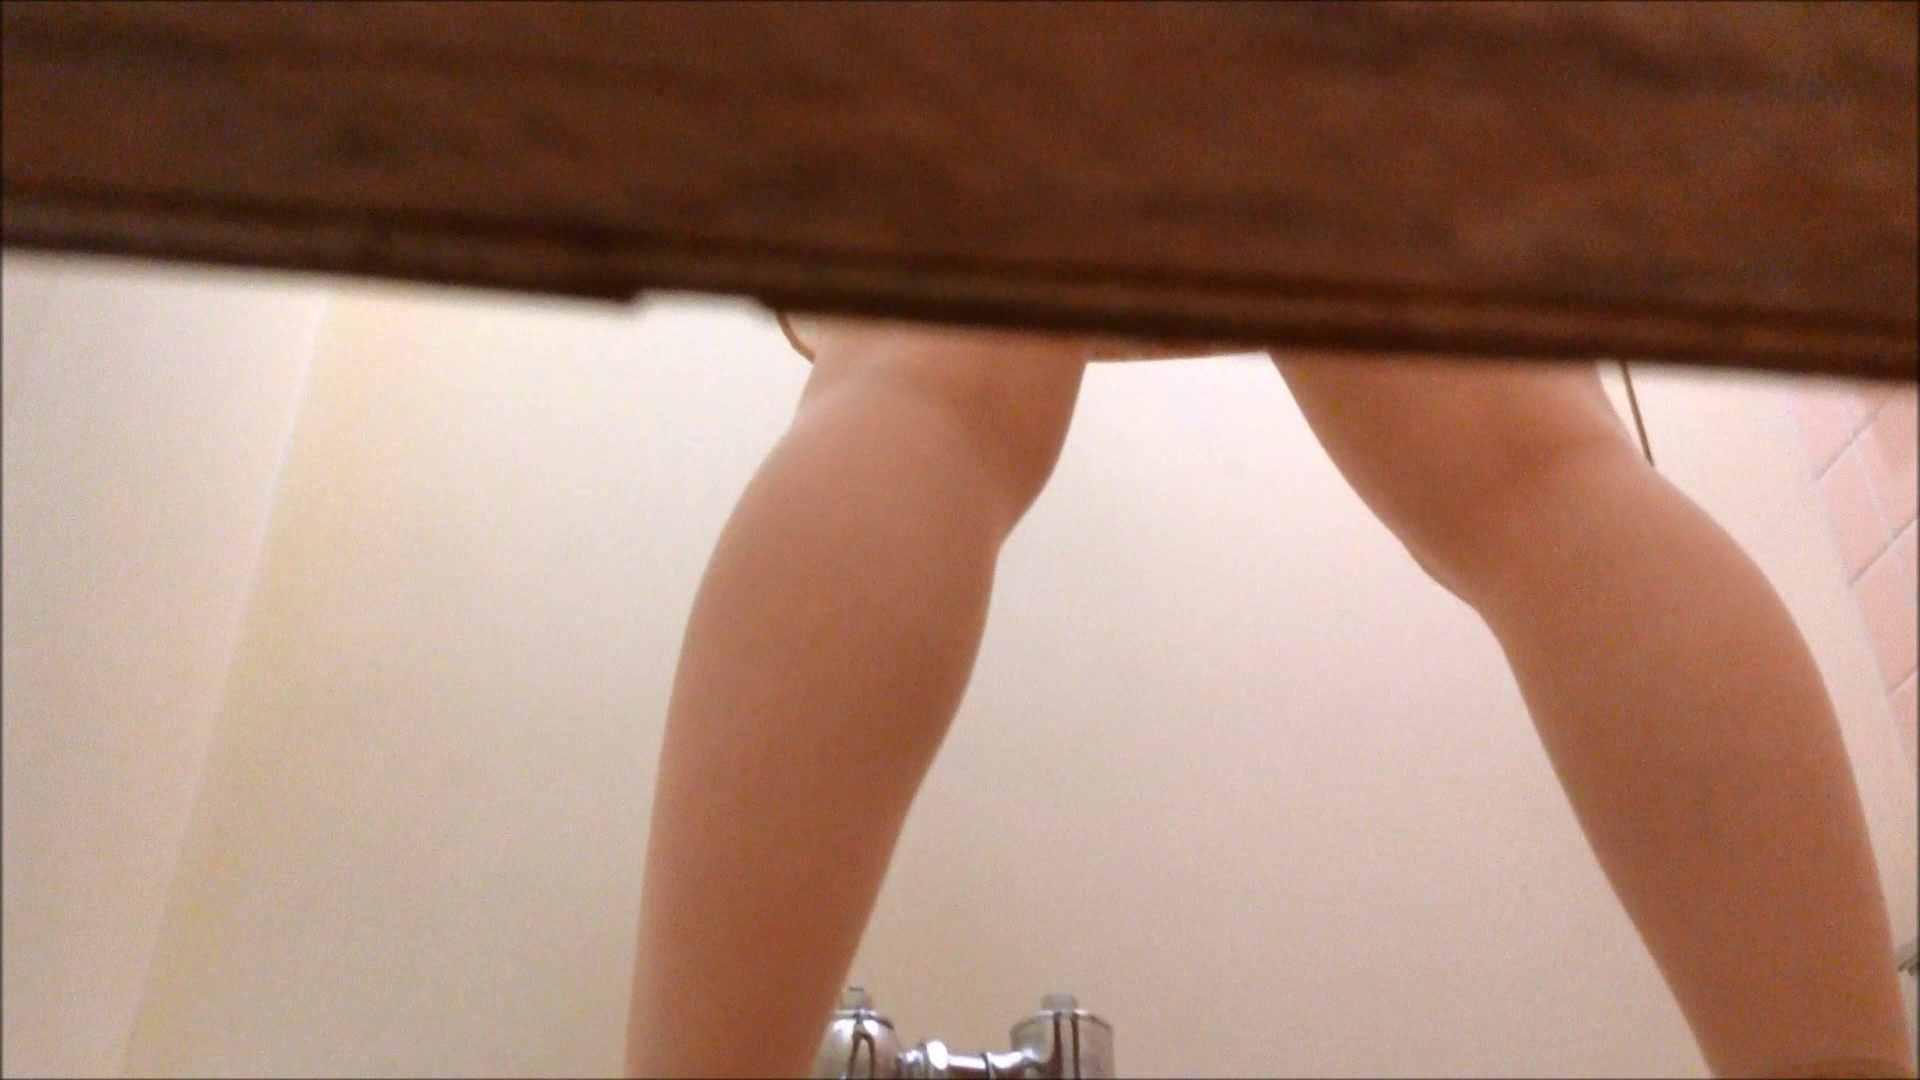 某有名大学女性洗面所 vol.14 丸見え おめこ無修正動画無料 87枚 35